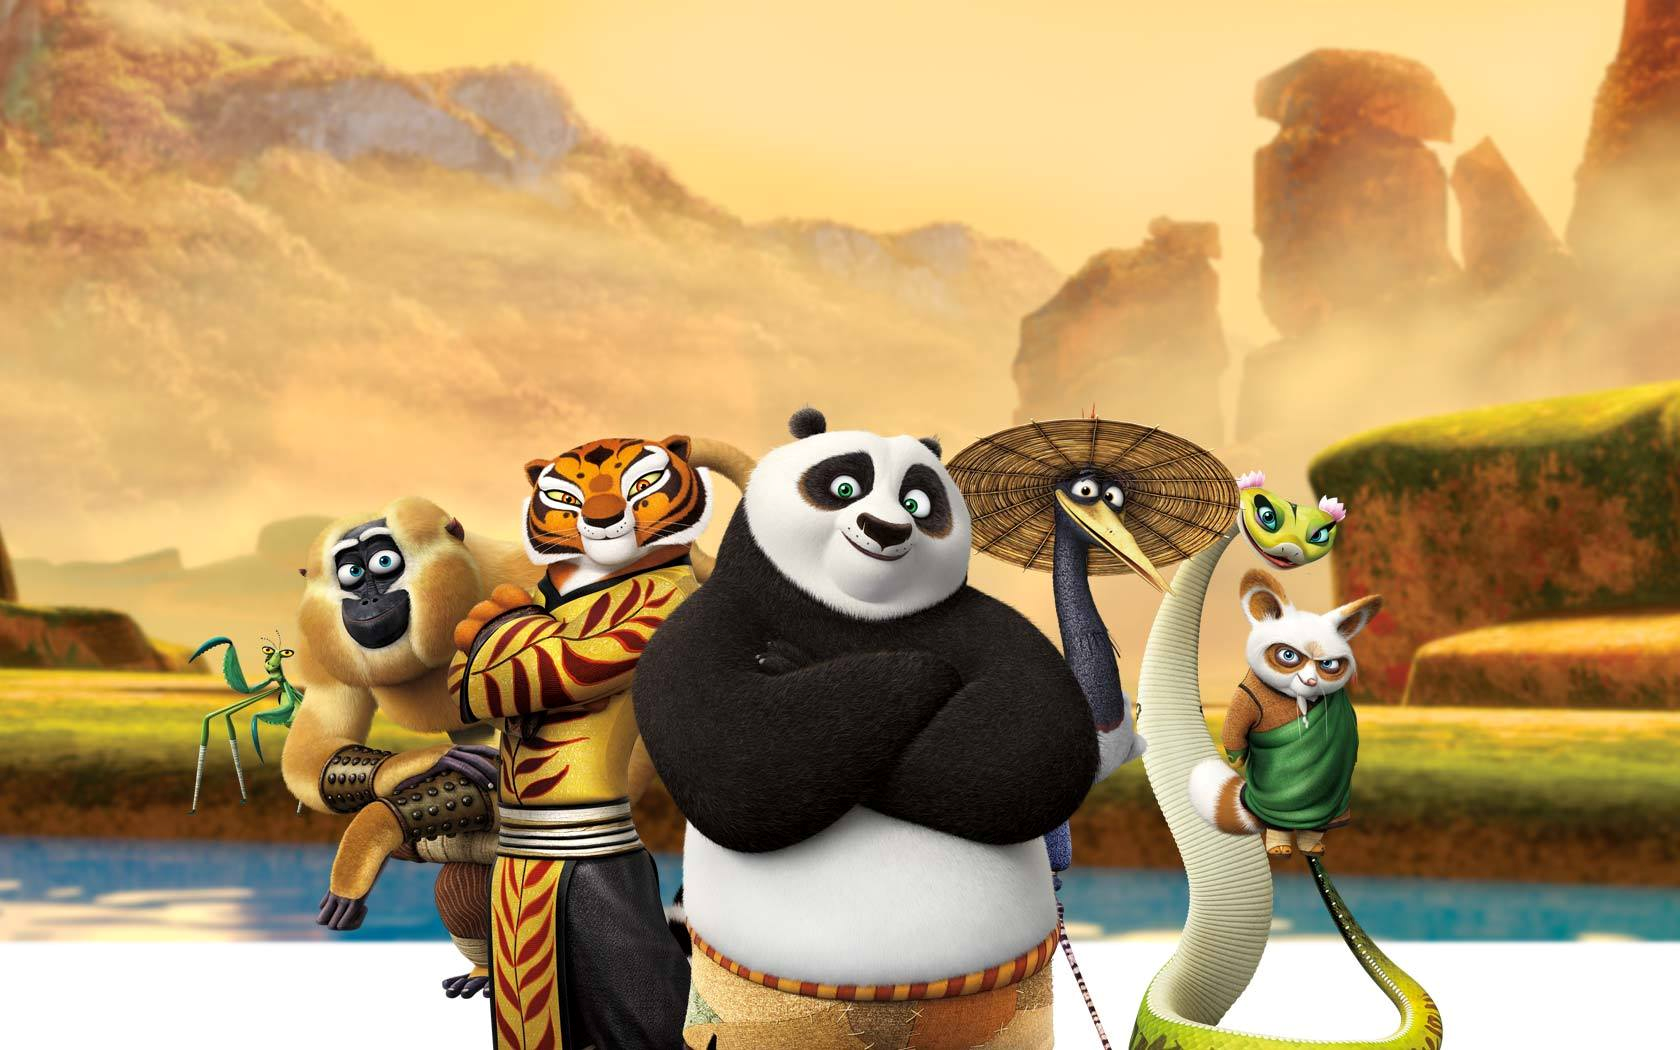 image - new kfp | kung fu panda wiki | fandom poweredwikia